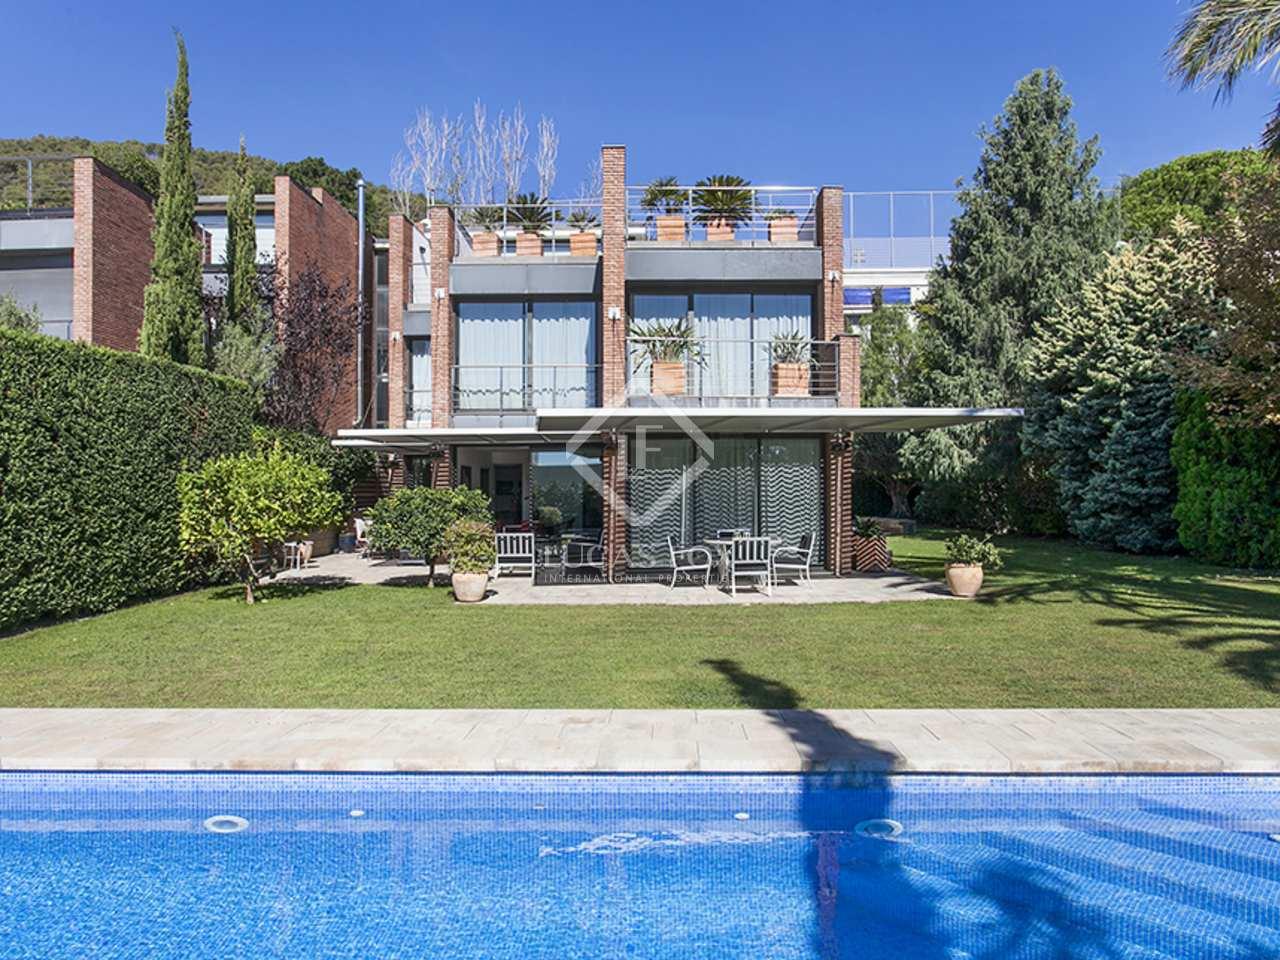 Fantastic Recently Renovated Luxury Houseto Buy Pedralbes